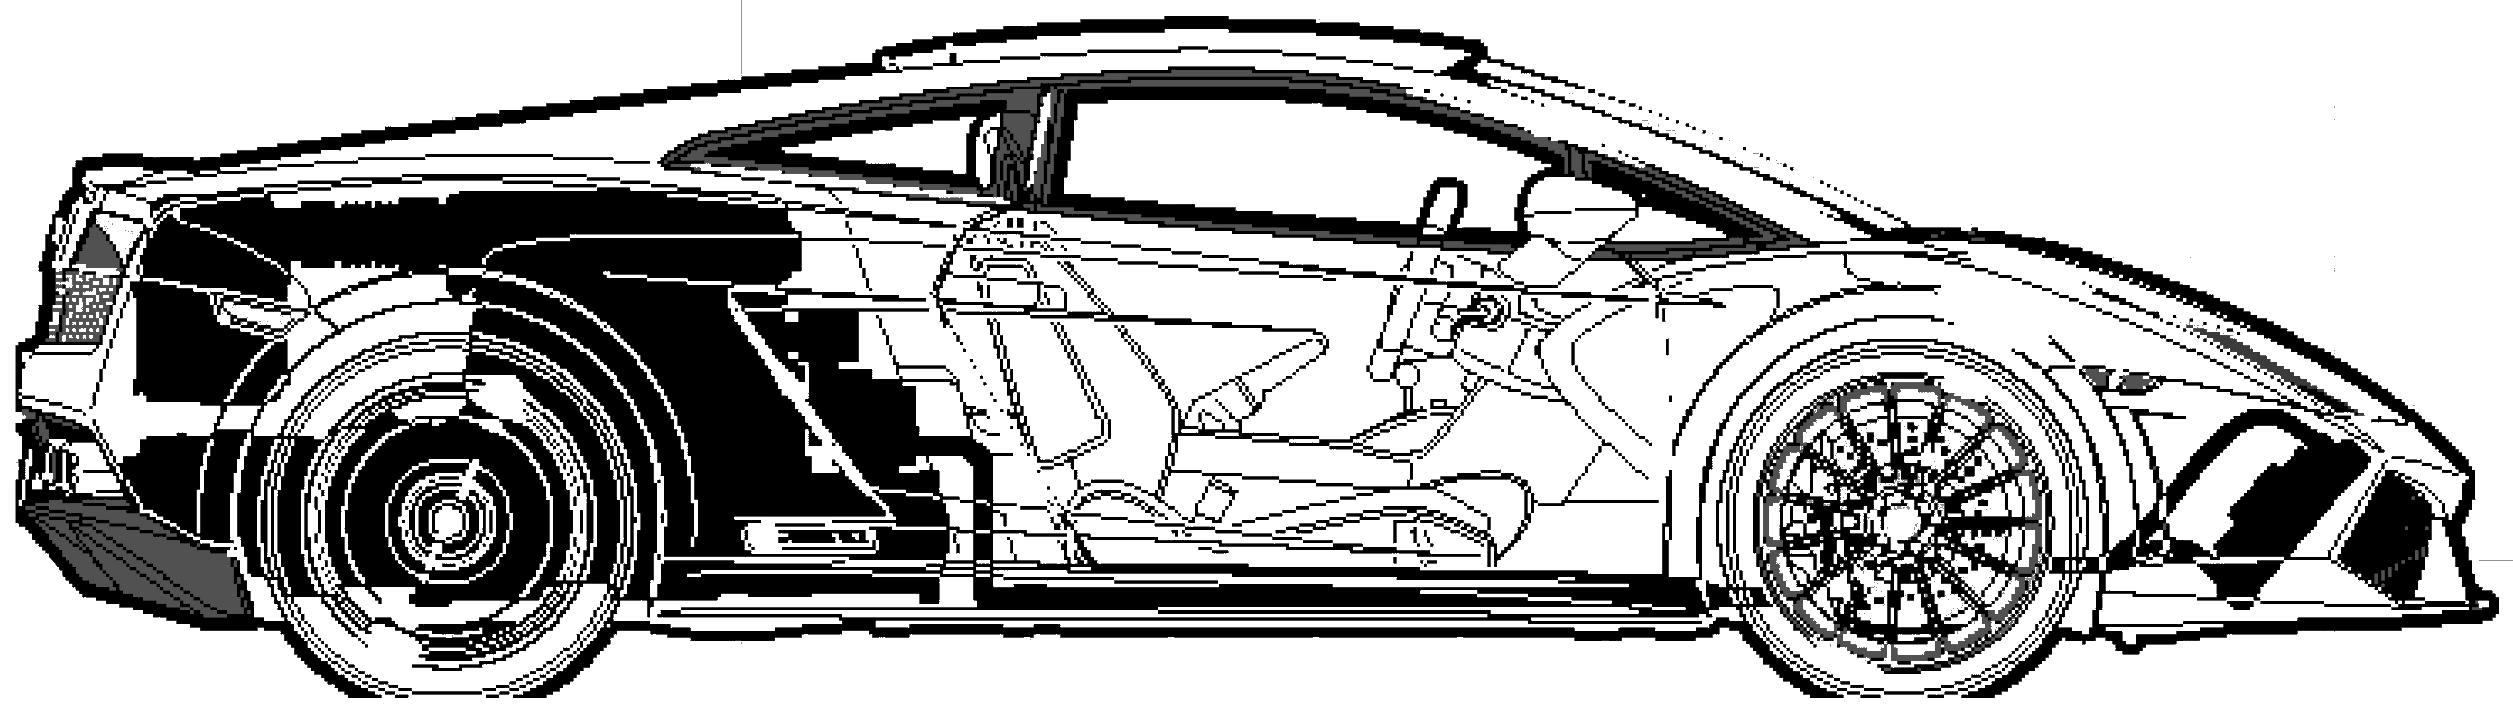 Lamborghini Gallardo LP550-2 Valentino Balboni blueprints